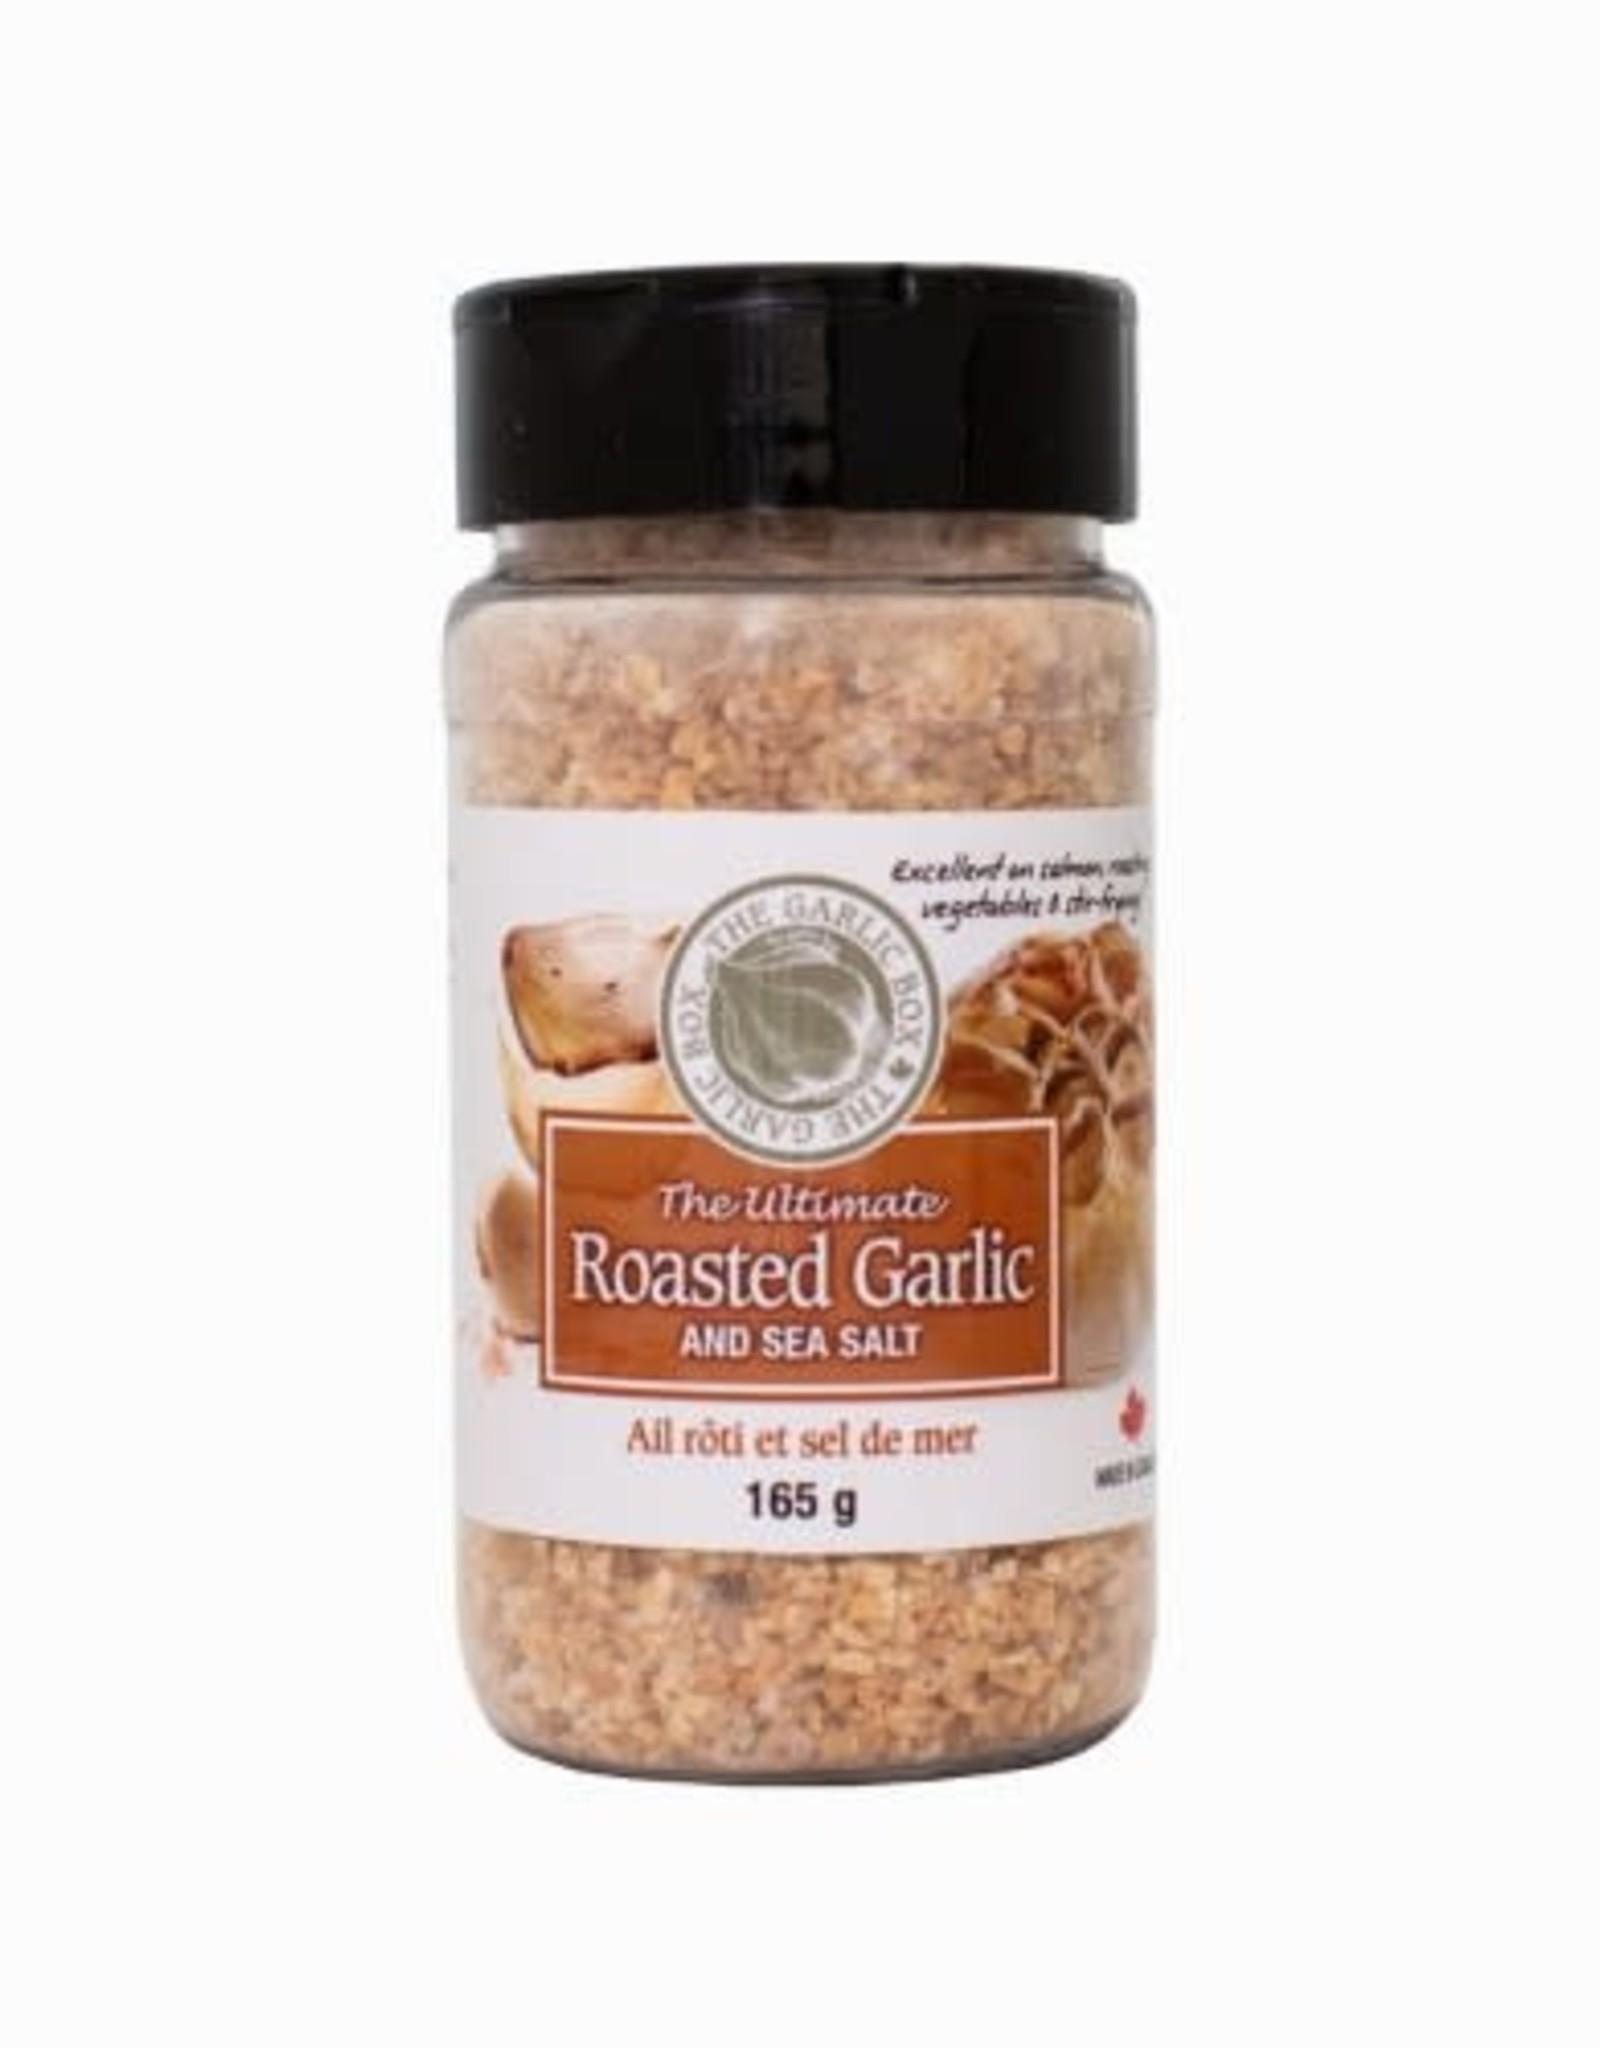 The Garlic Box Roasted Garlic & Sea Salt